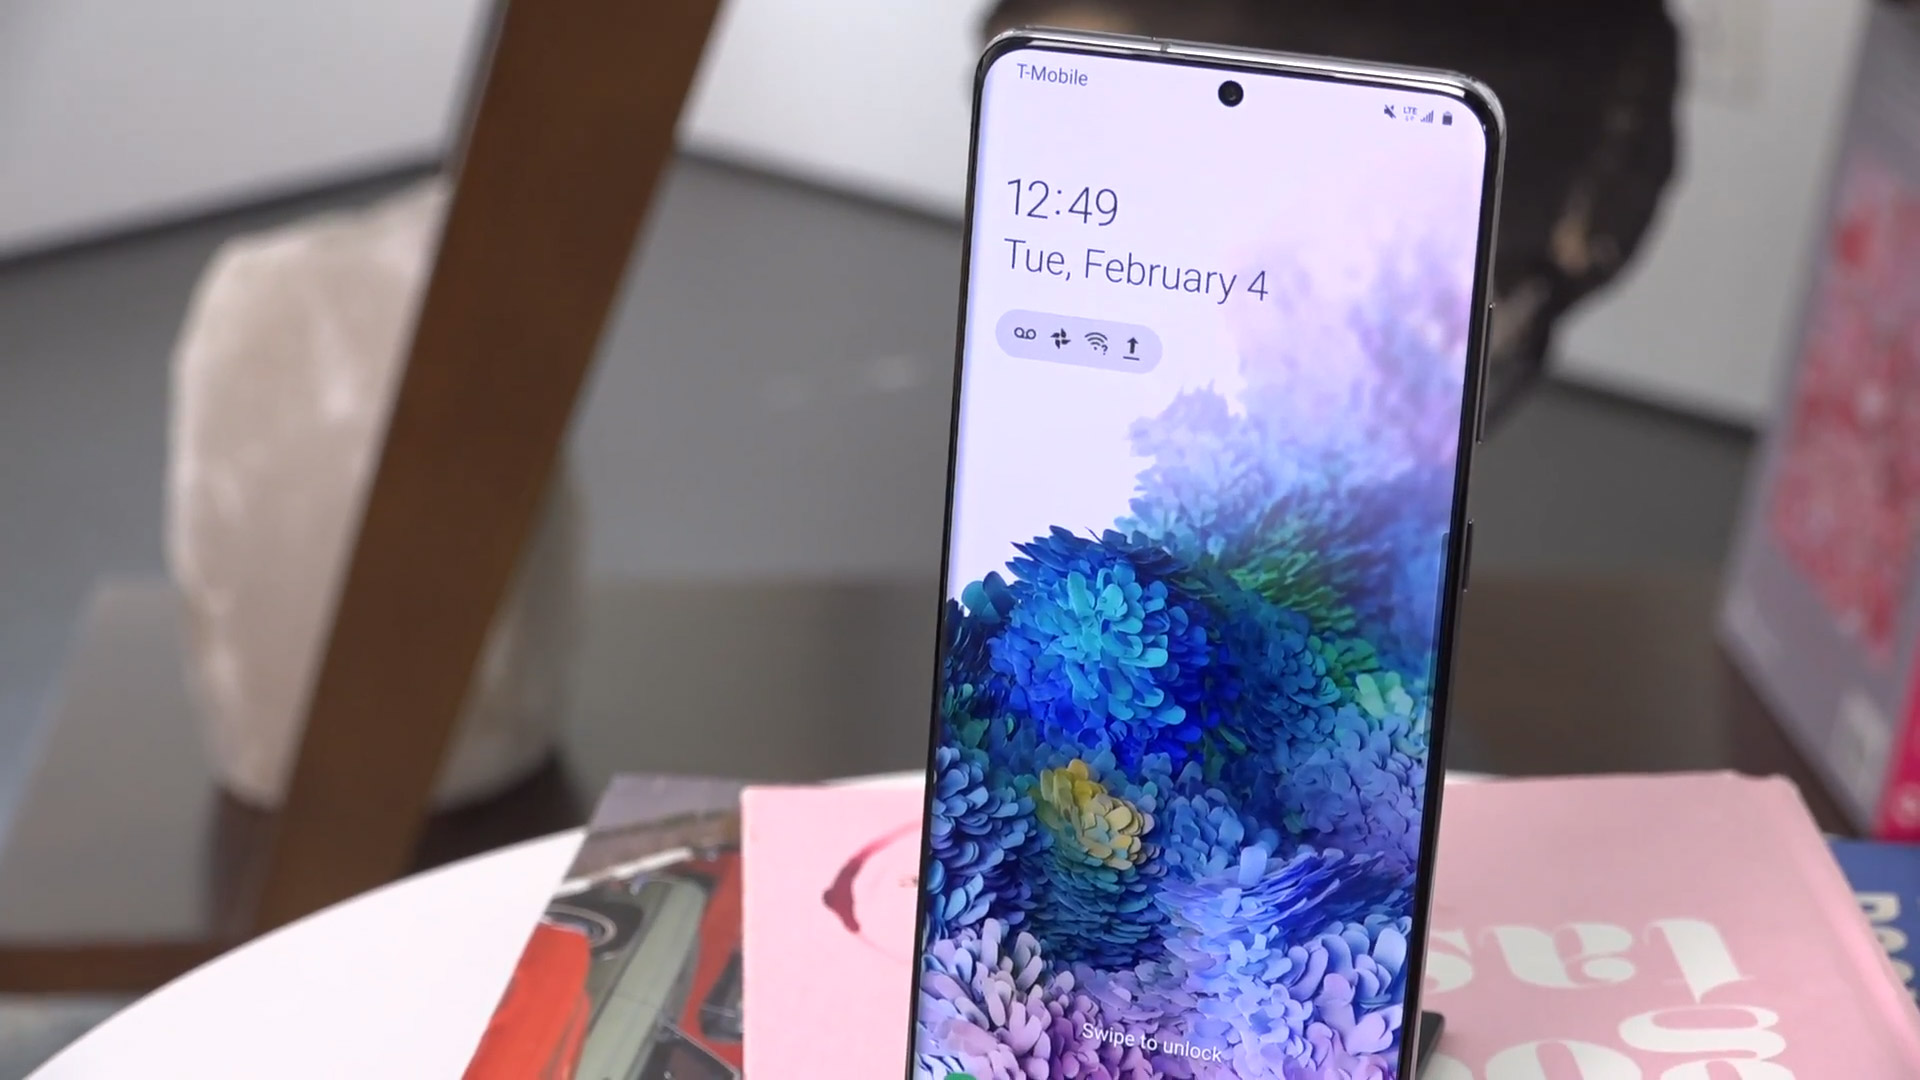 Samsung Galaxy S20 Ultra Has The Best Screen Ever Seen On A Phone Techradar